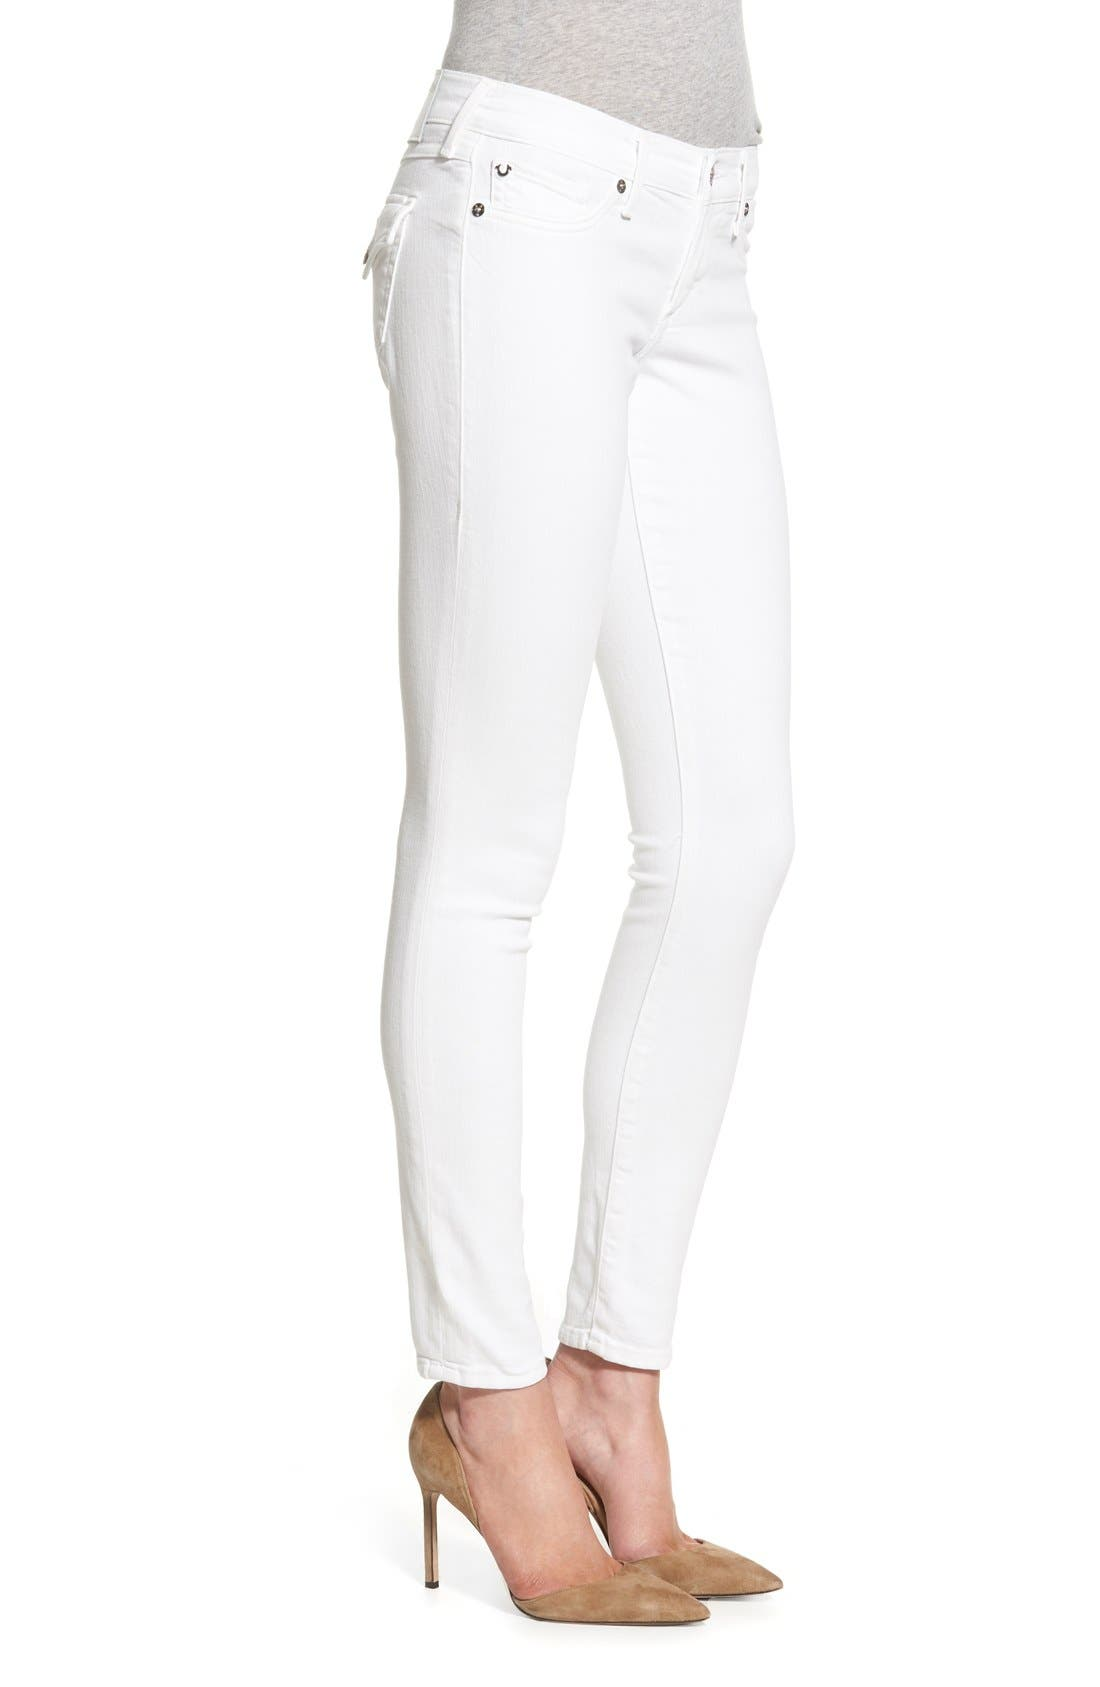 Alternate Image 3  - True Religion Brand Jeans 'Casey' Flap Pocket Skinny Jeans (Optic White)